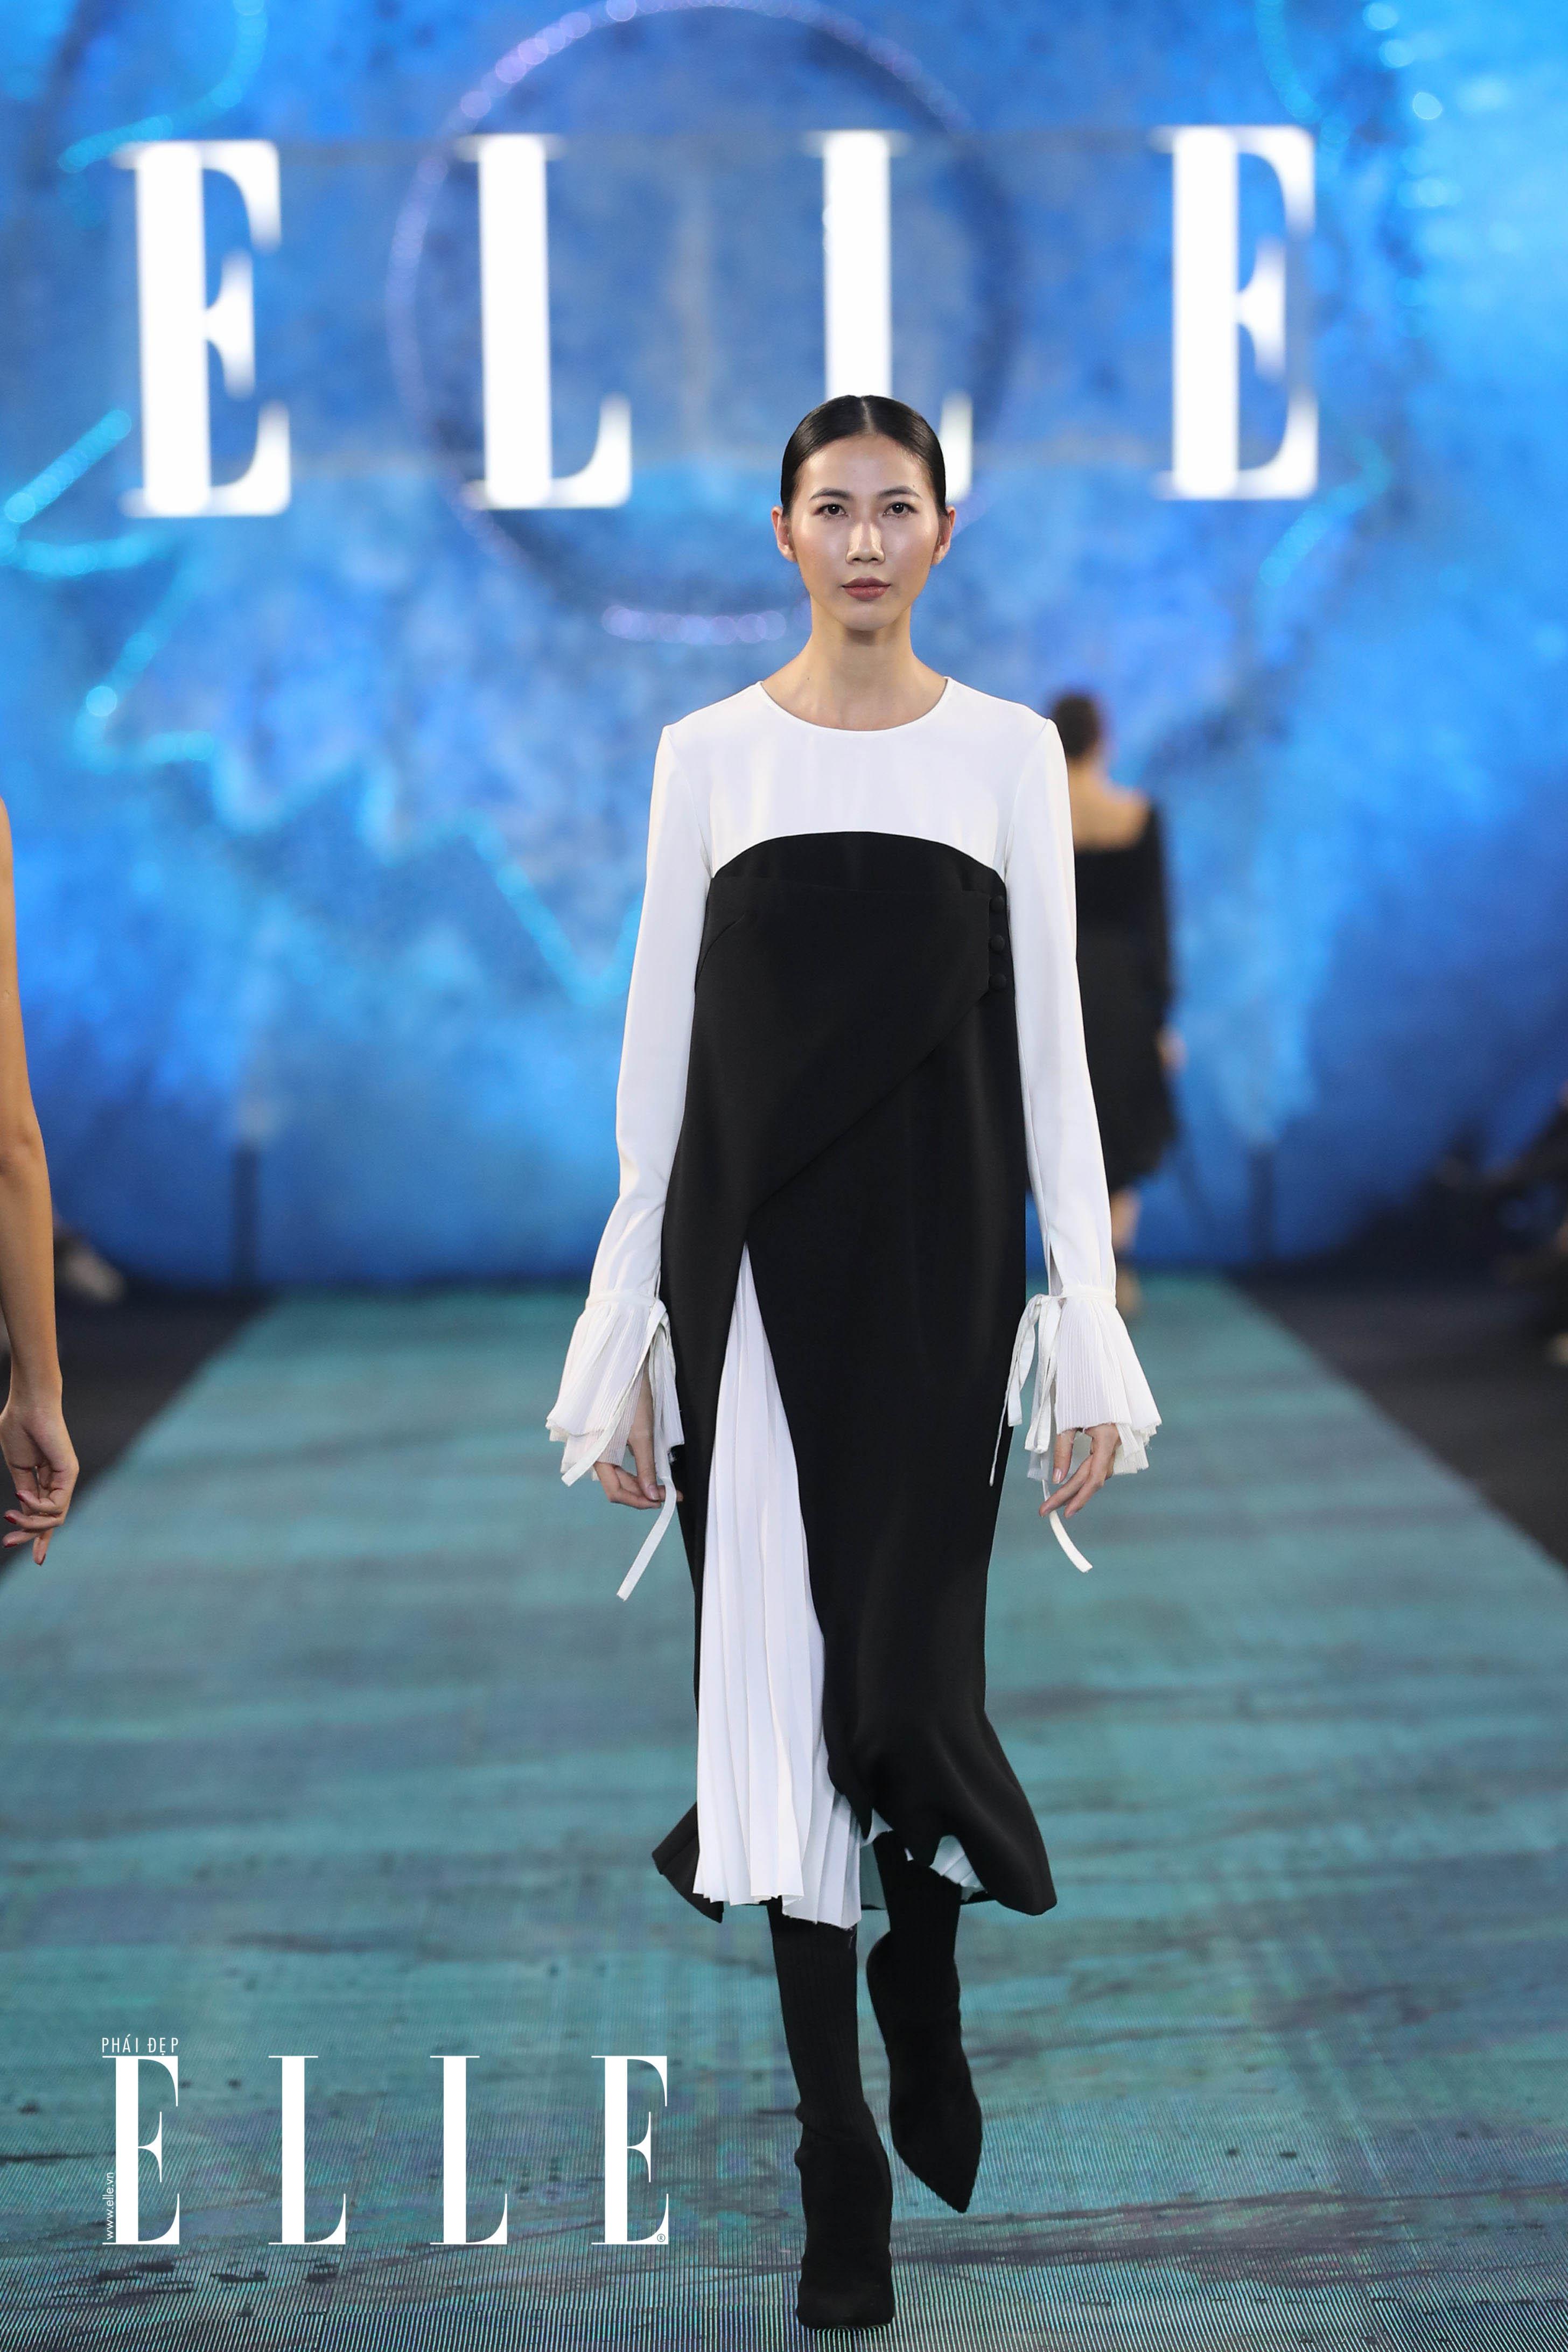 xu huong trang tu nhien diem thong linh san dien elle fashion journey 2018 15